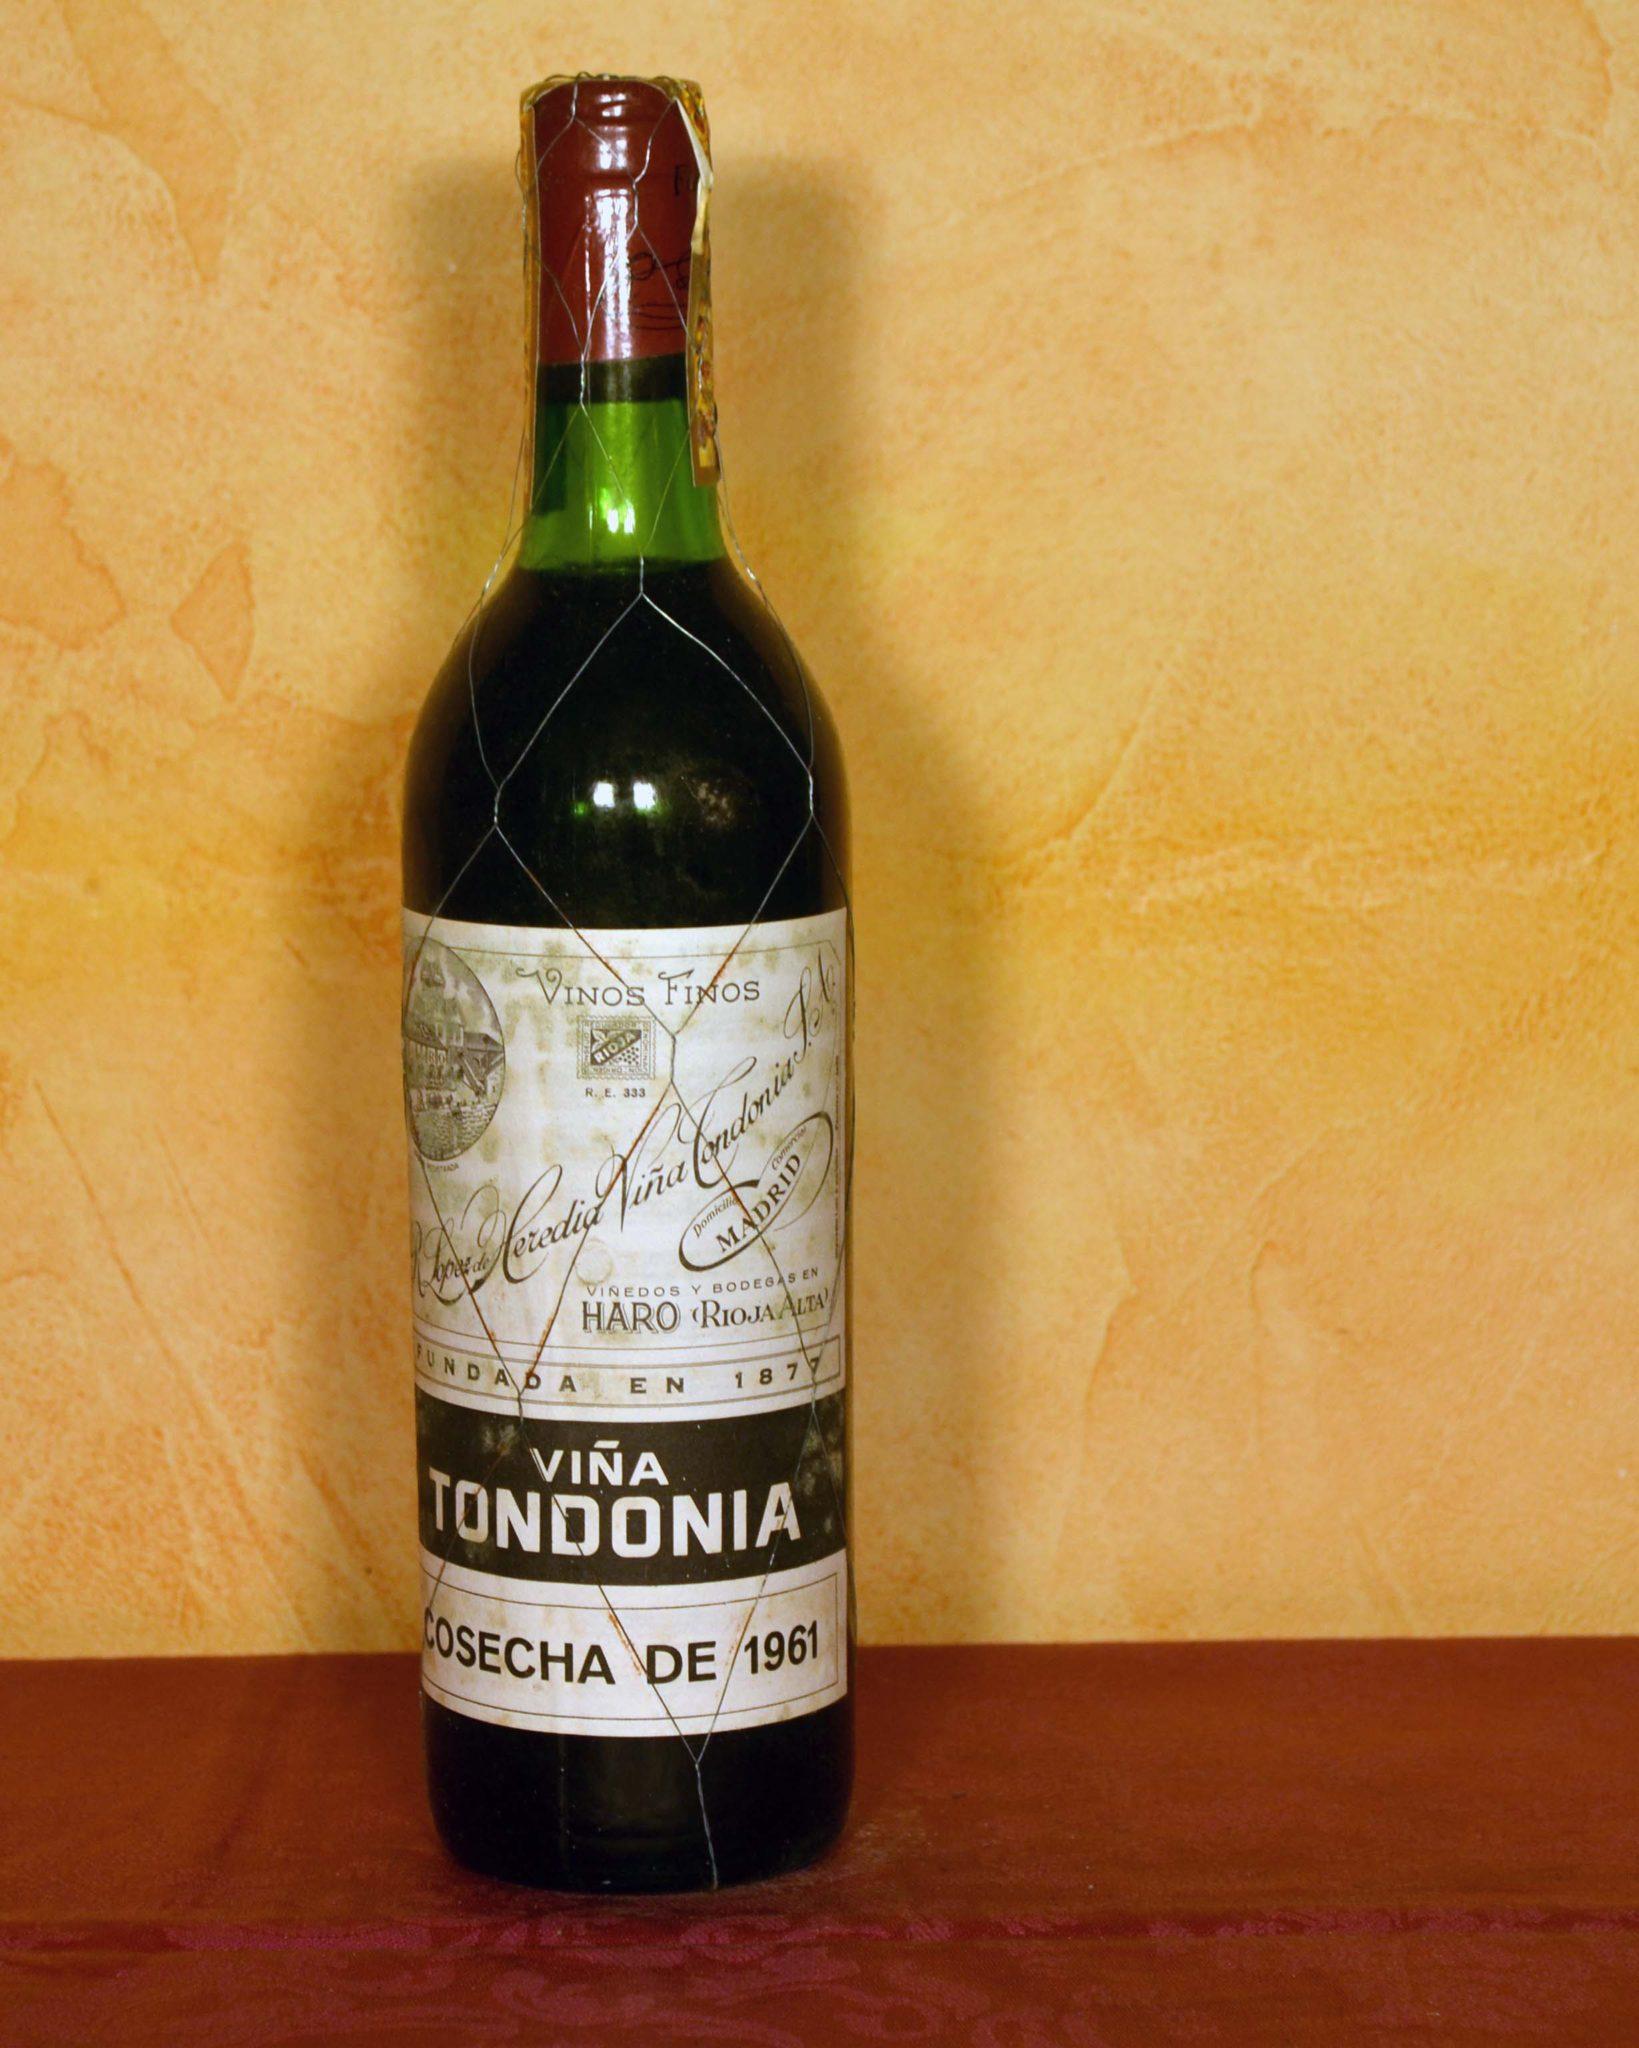 Viña Tondonia Gran Reserva 1961